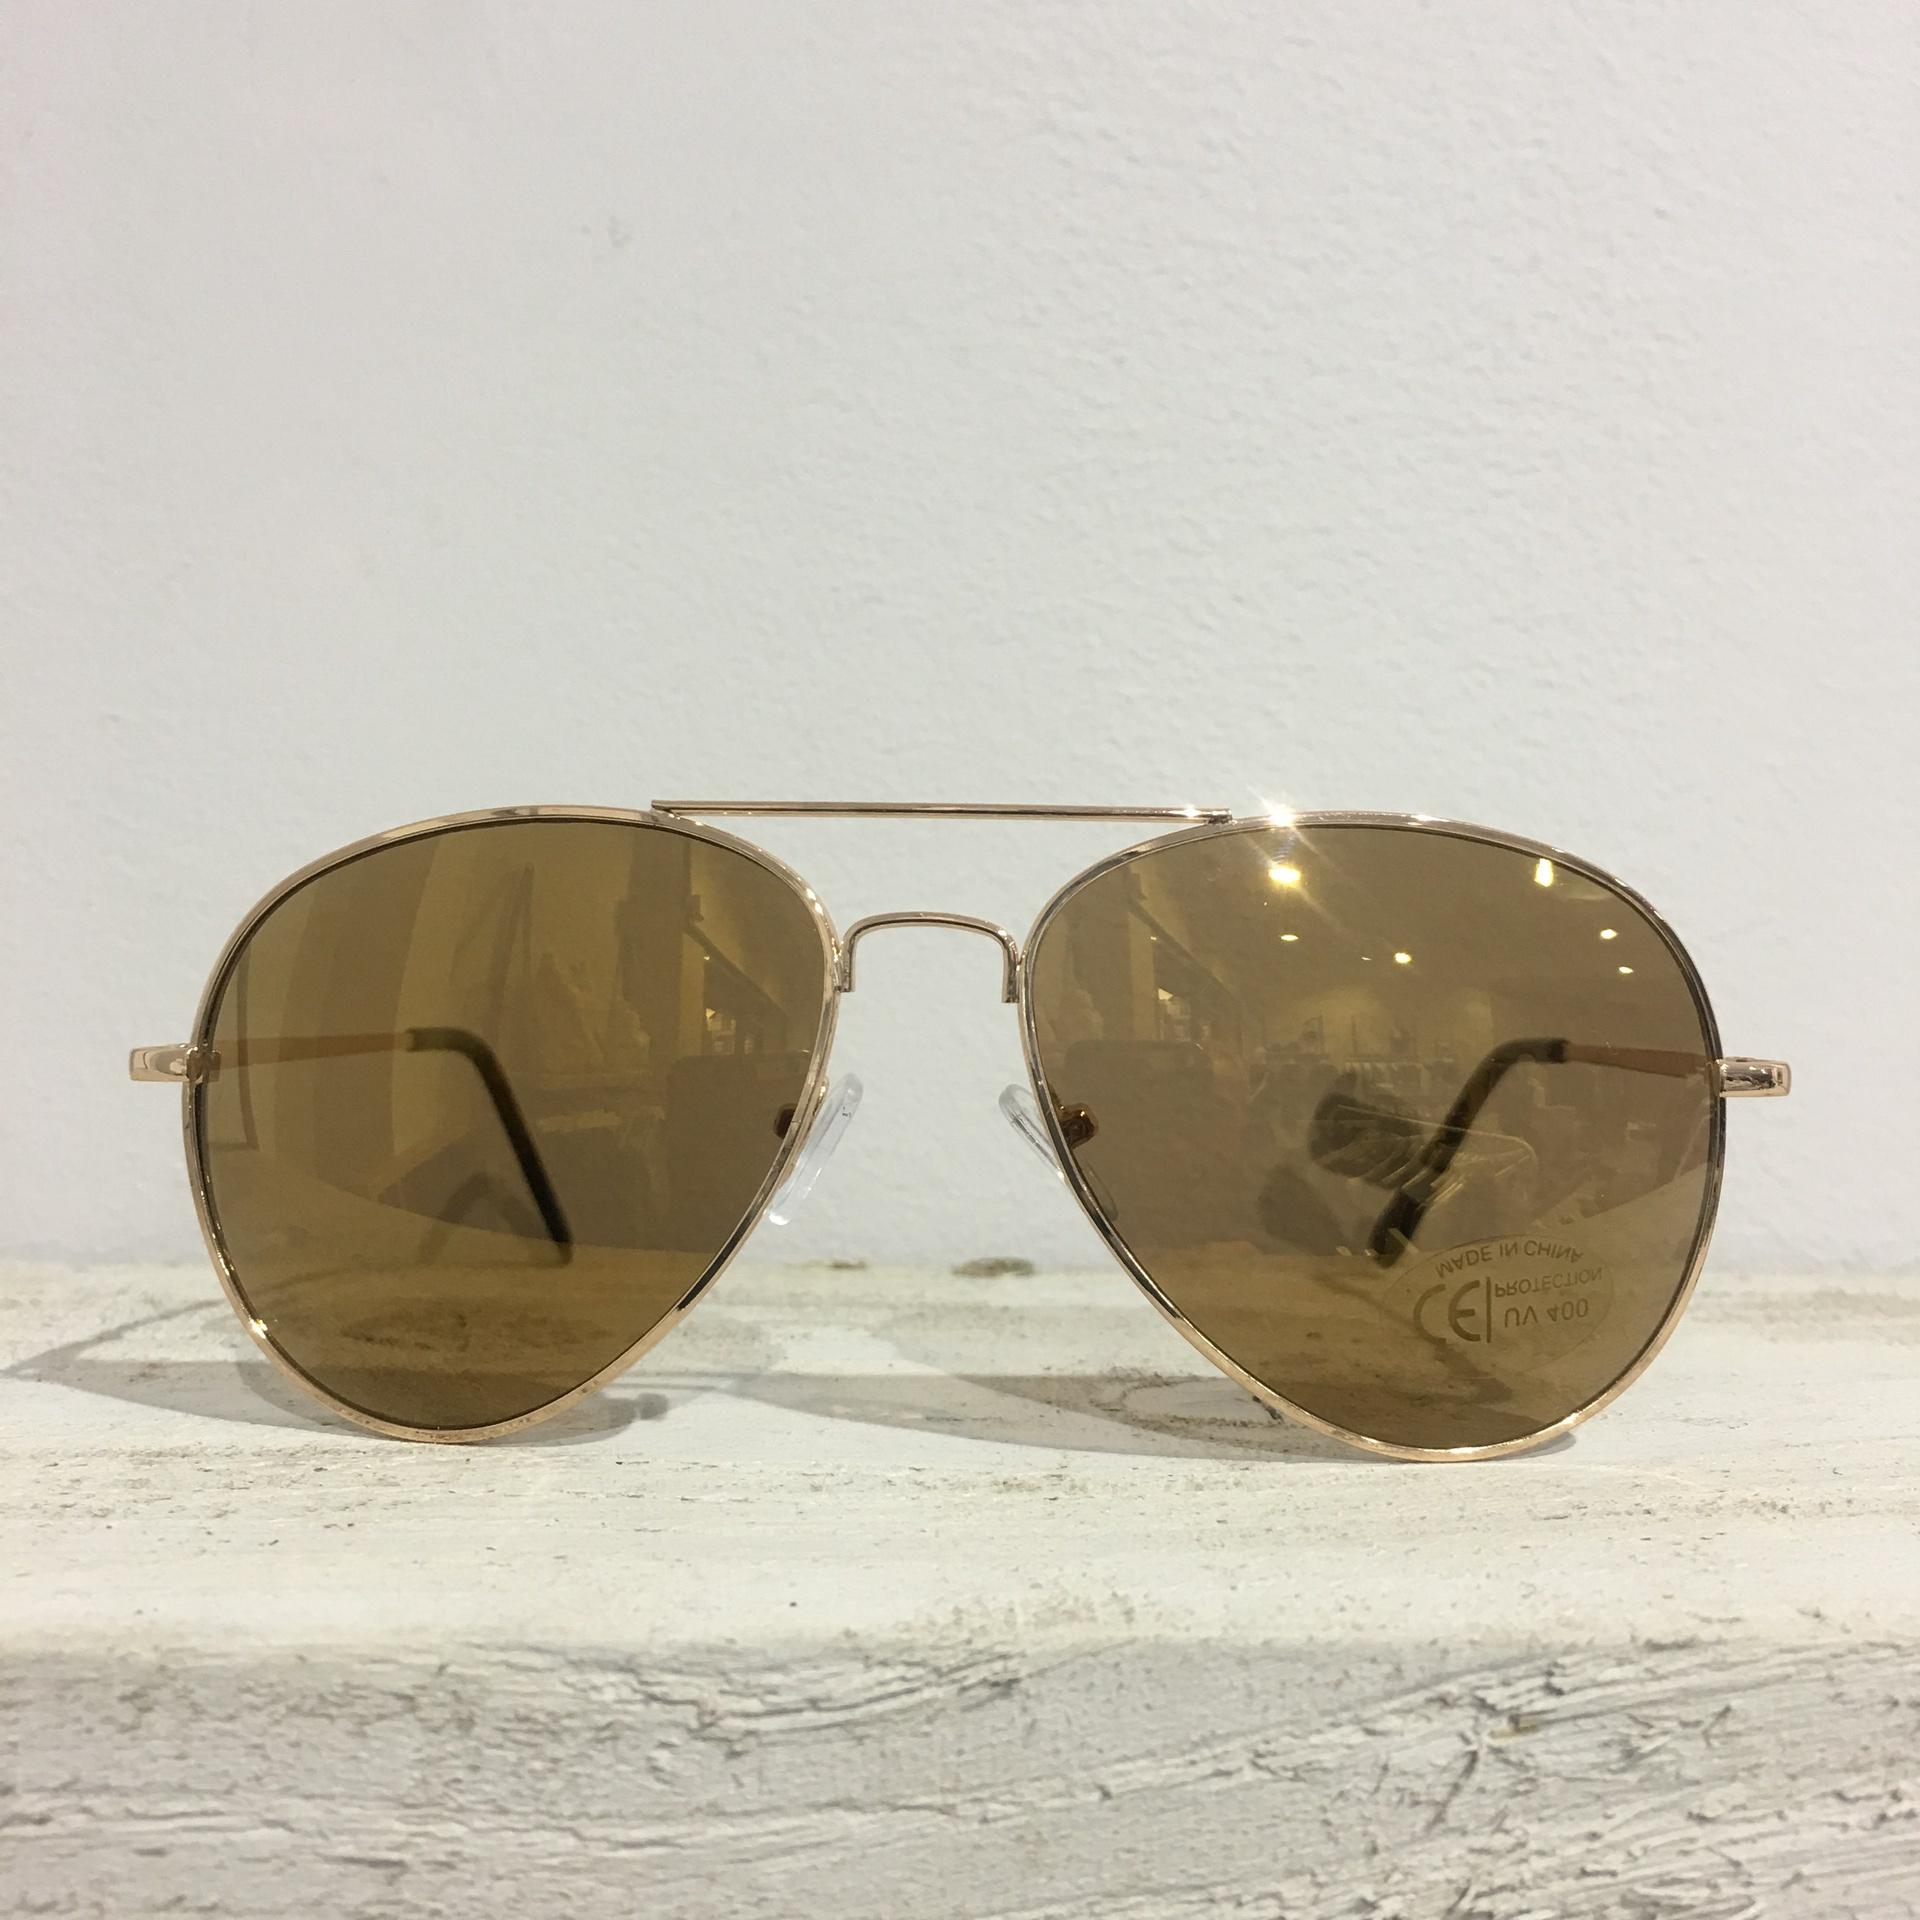 Sunglasses - Golden Aviators